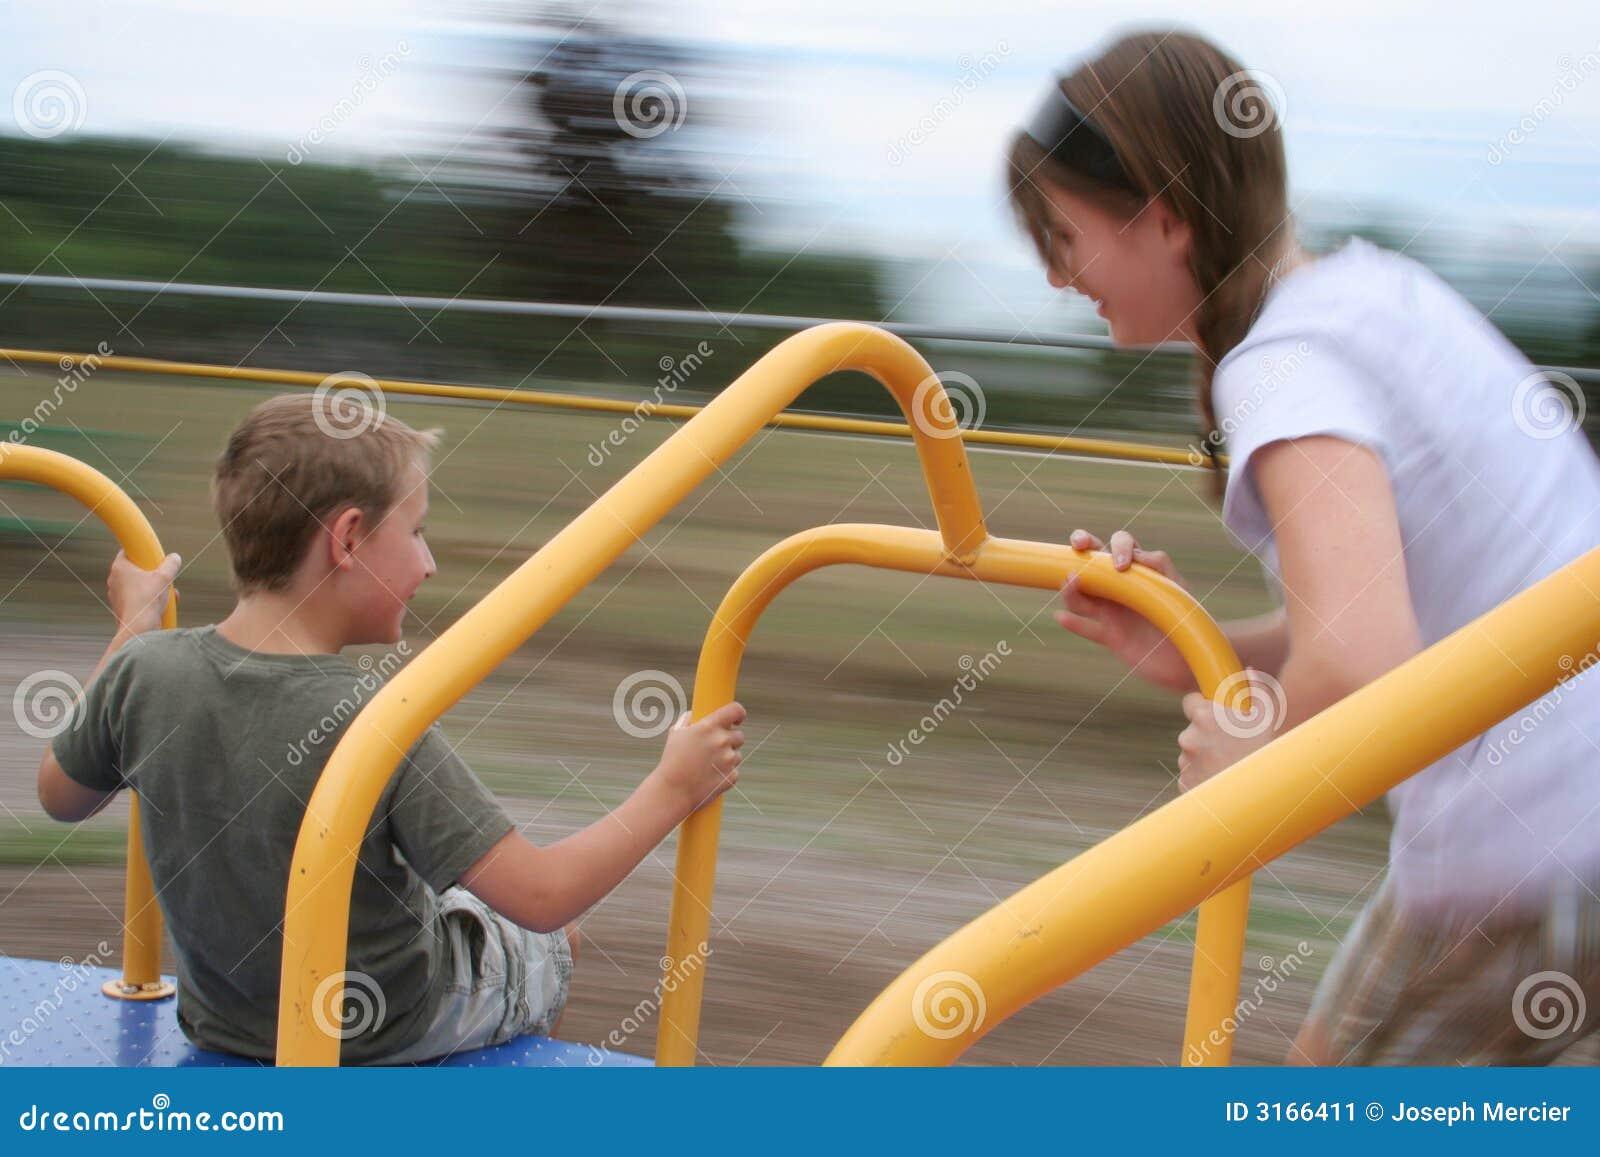 Kids Playground Fun